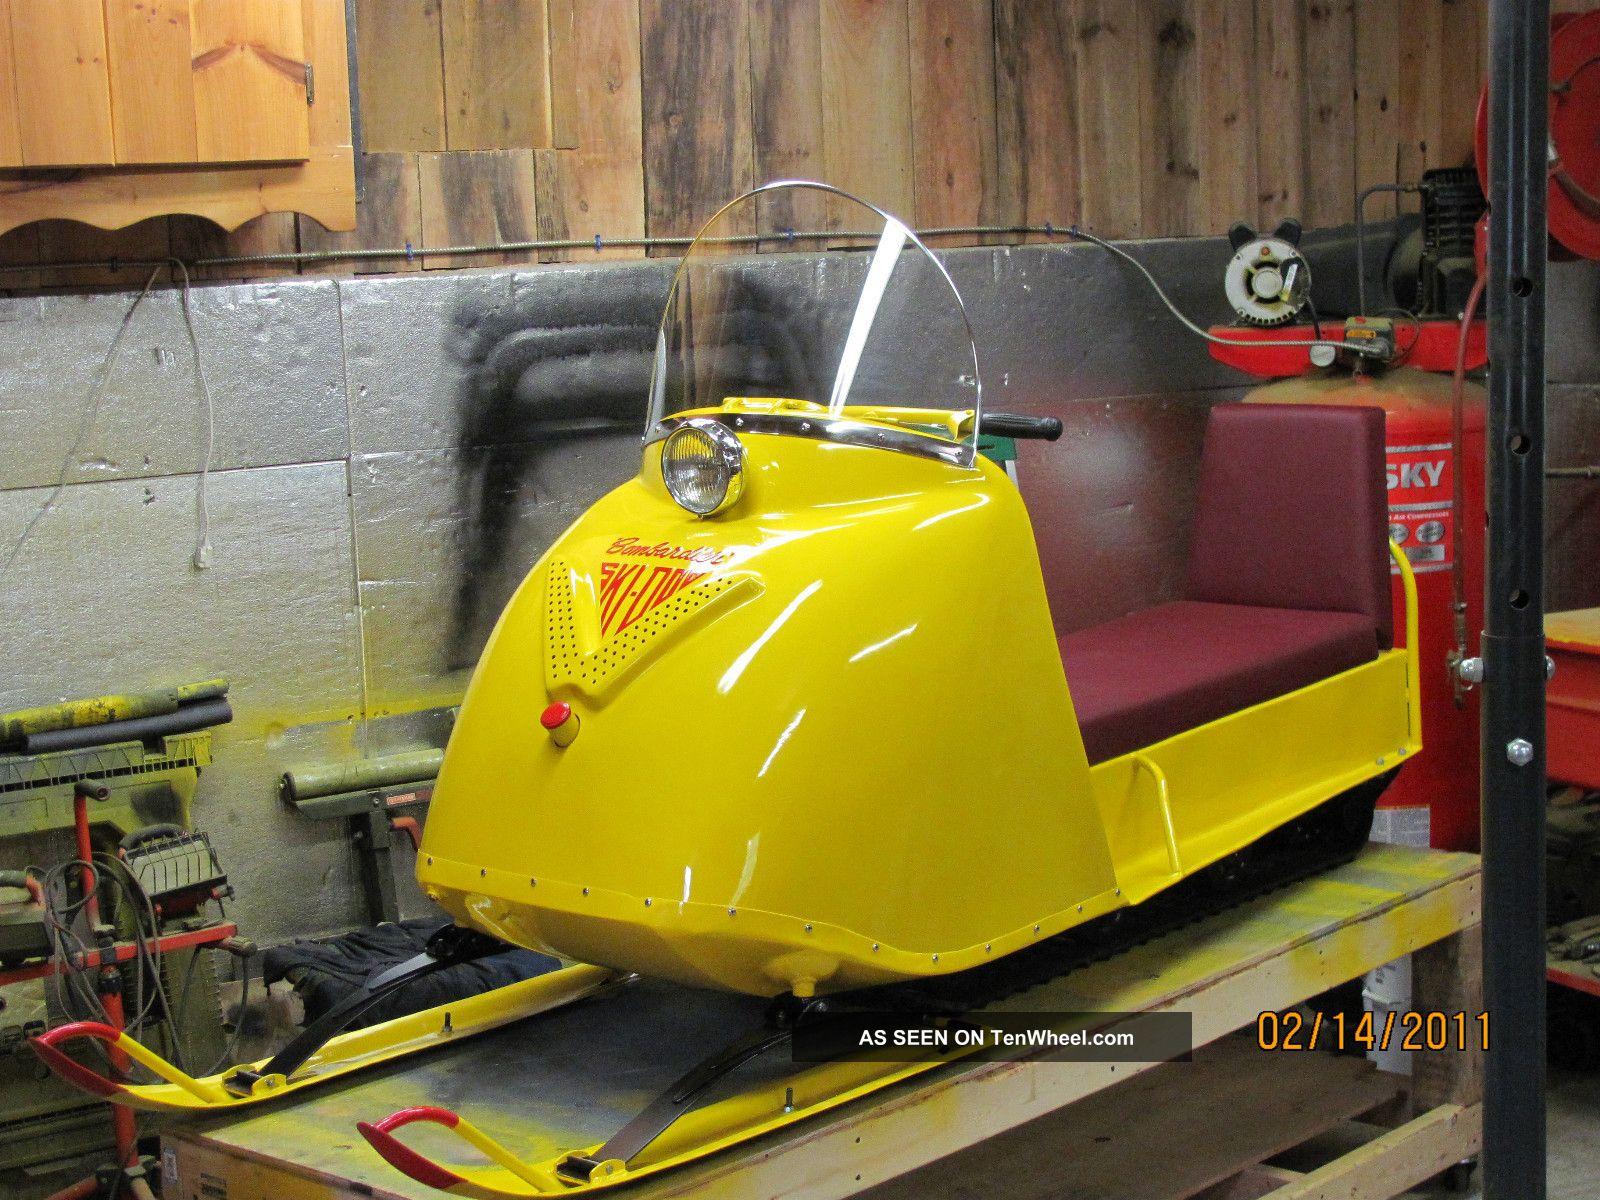 1965 Ski - Doo Ski-Doo photo